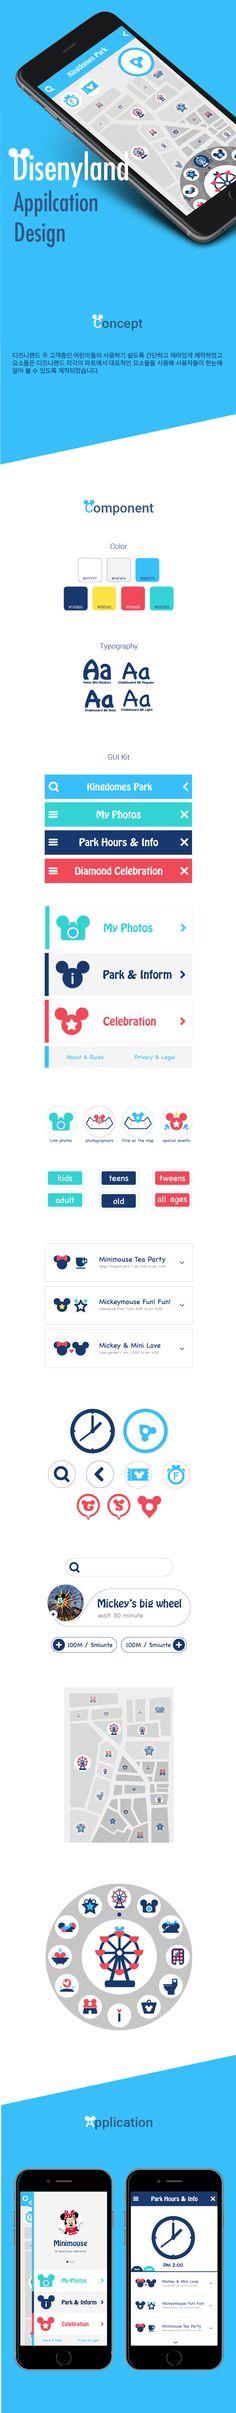 Lee, hae sung | Project Title : Disney land GUI kit | Visual Interface Design(2) 2016 | Major in Digital Media Design │#hicoda │hicoda.hongik.ac.kr